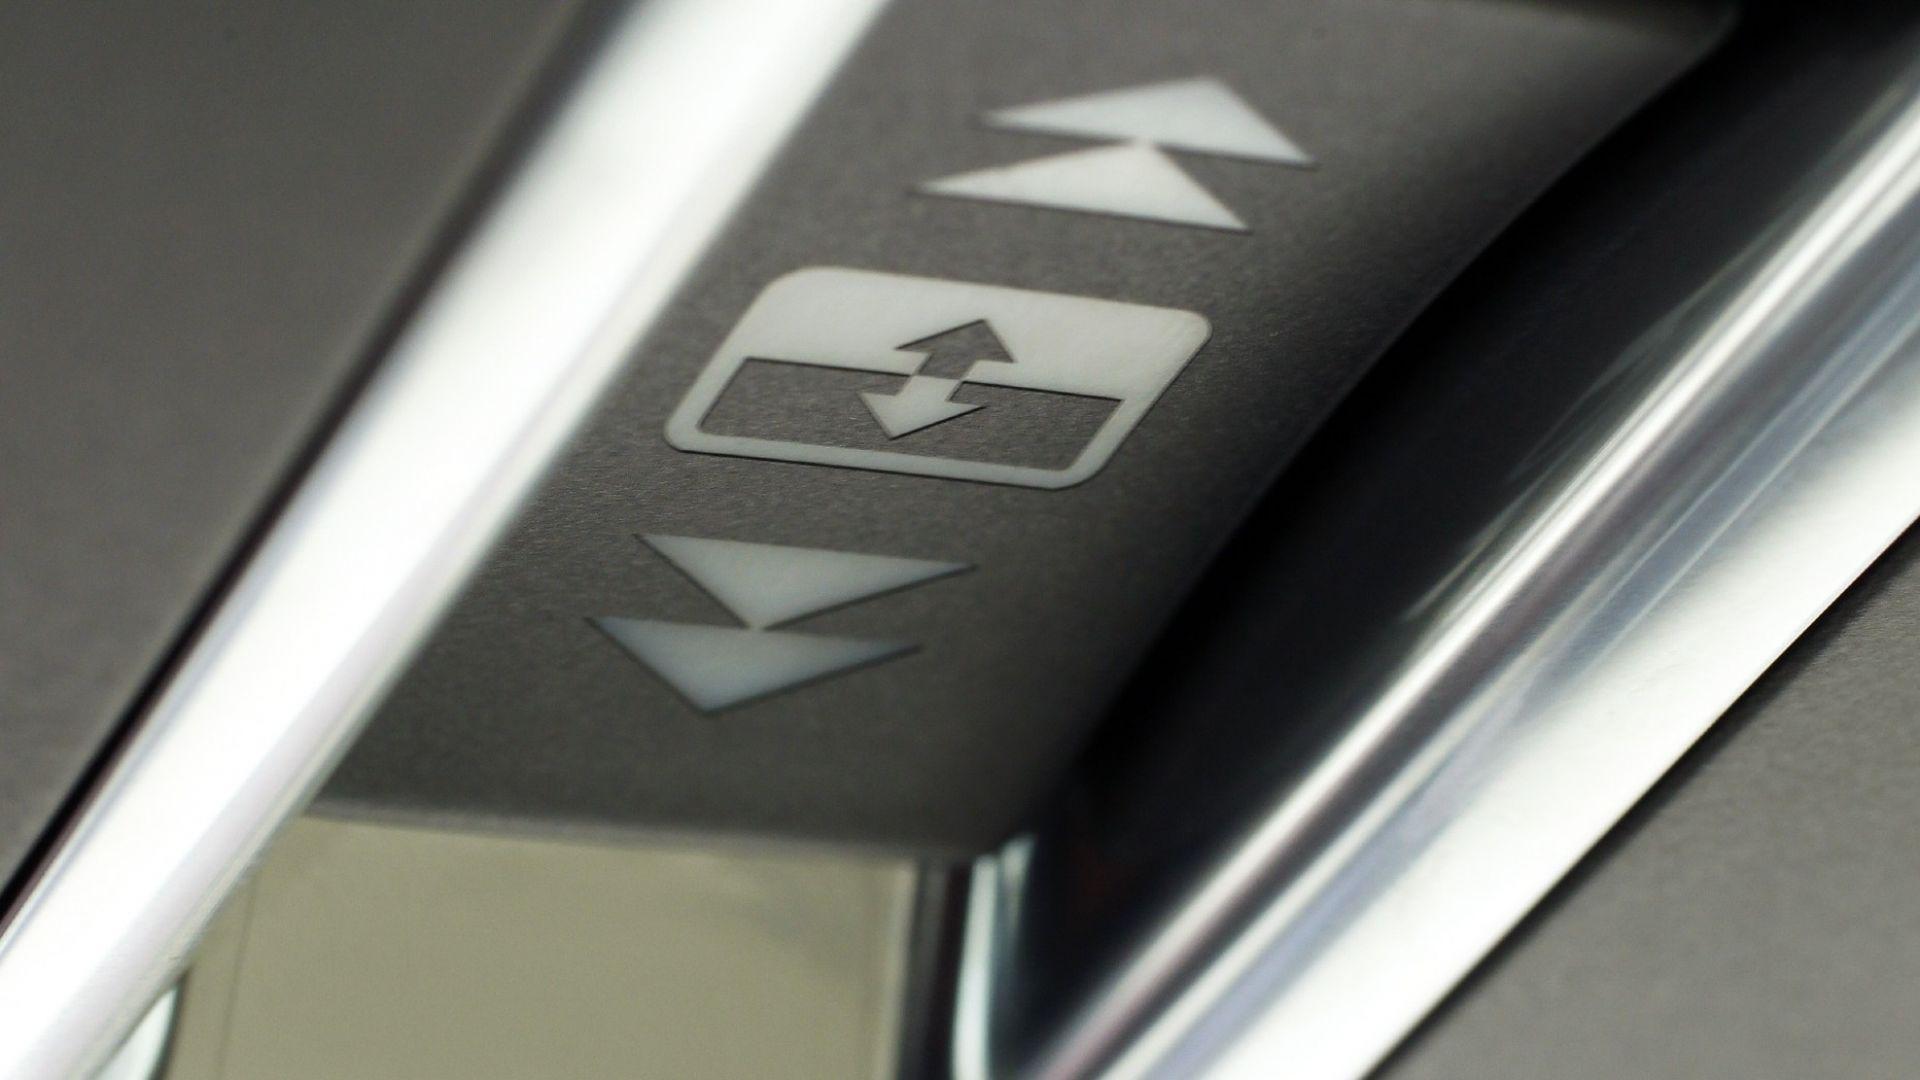 Immagine 137: Range Rover Evoque